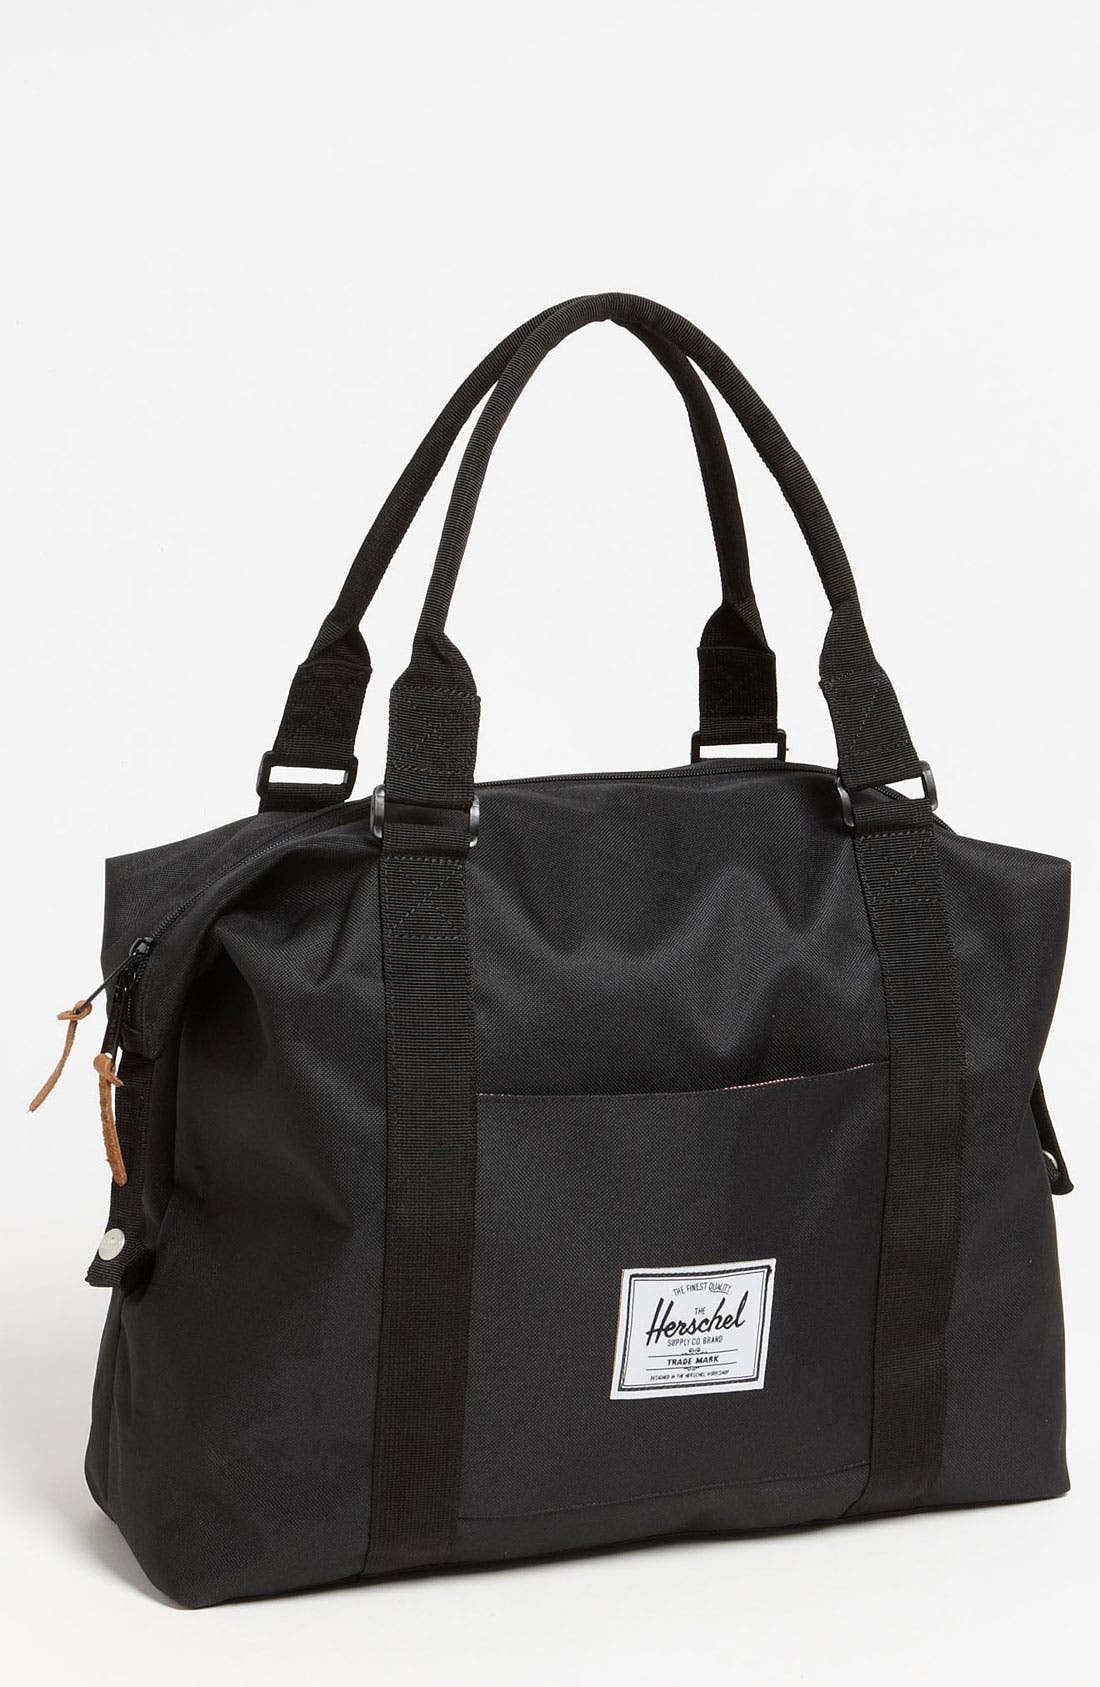 Herschel Supply Co. 'Strand' Duffel Bag